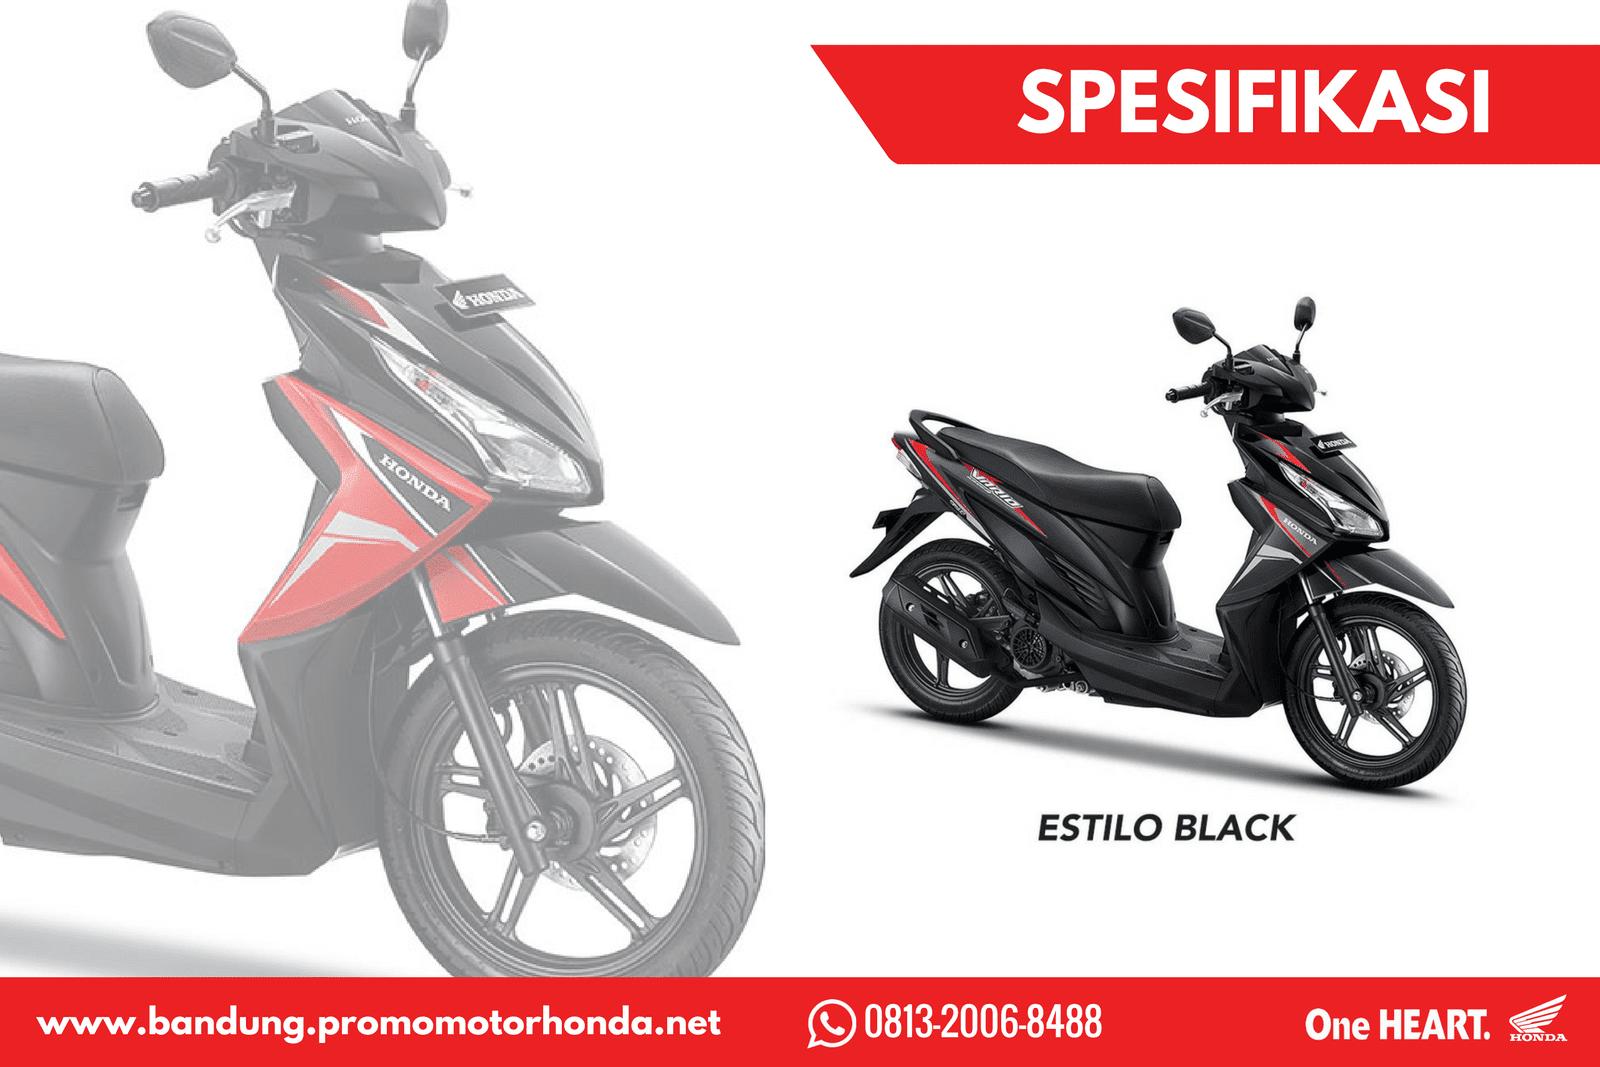 Kredit Motor Honda Vario 110 Bandung New Esp Cbs Grande White Kota Semarang Spesifikasi